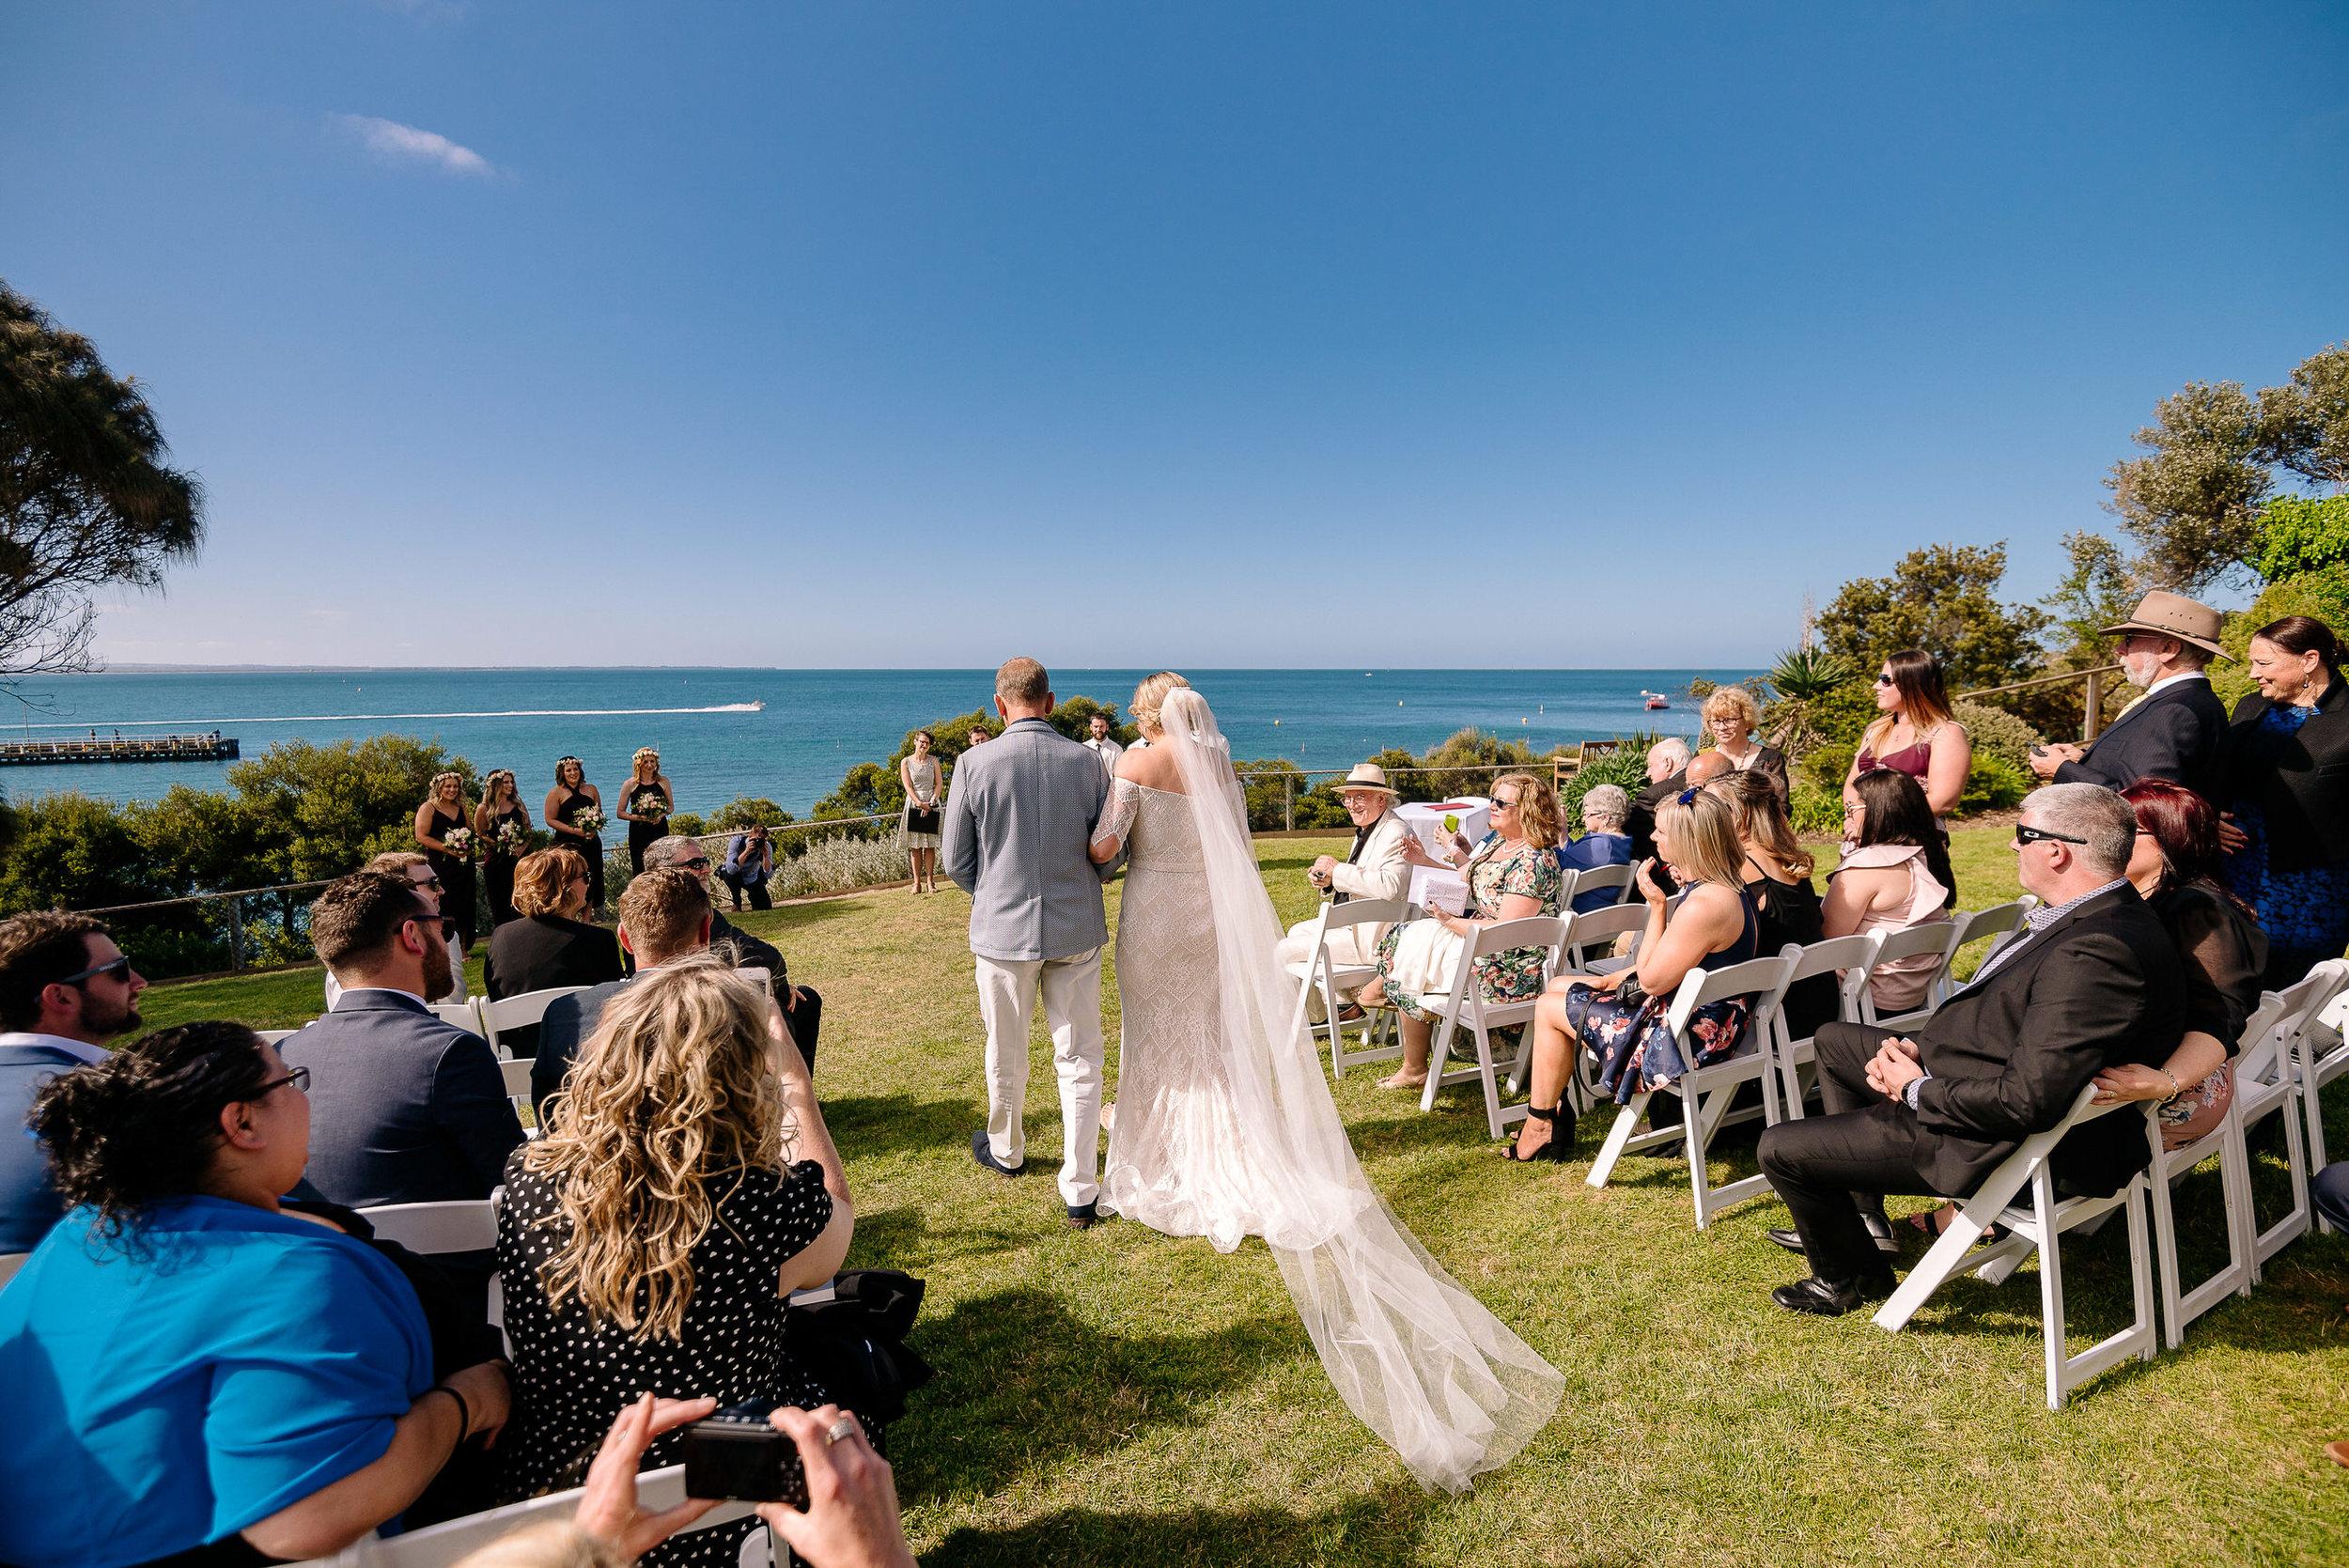 Justin_And_Jim_Photography_Portsea_Pub_Wedding60.JPG